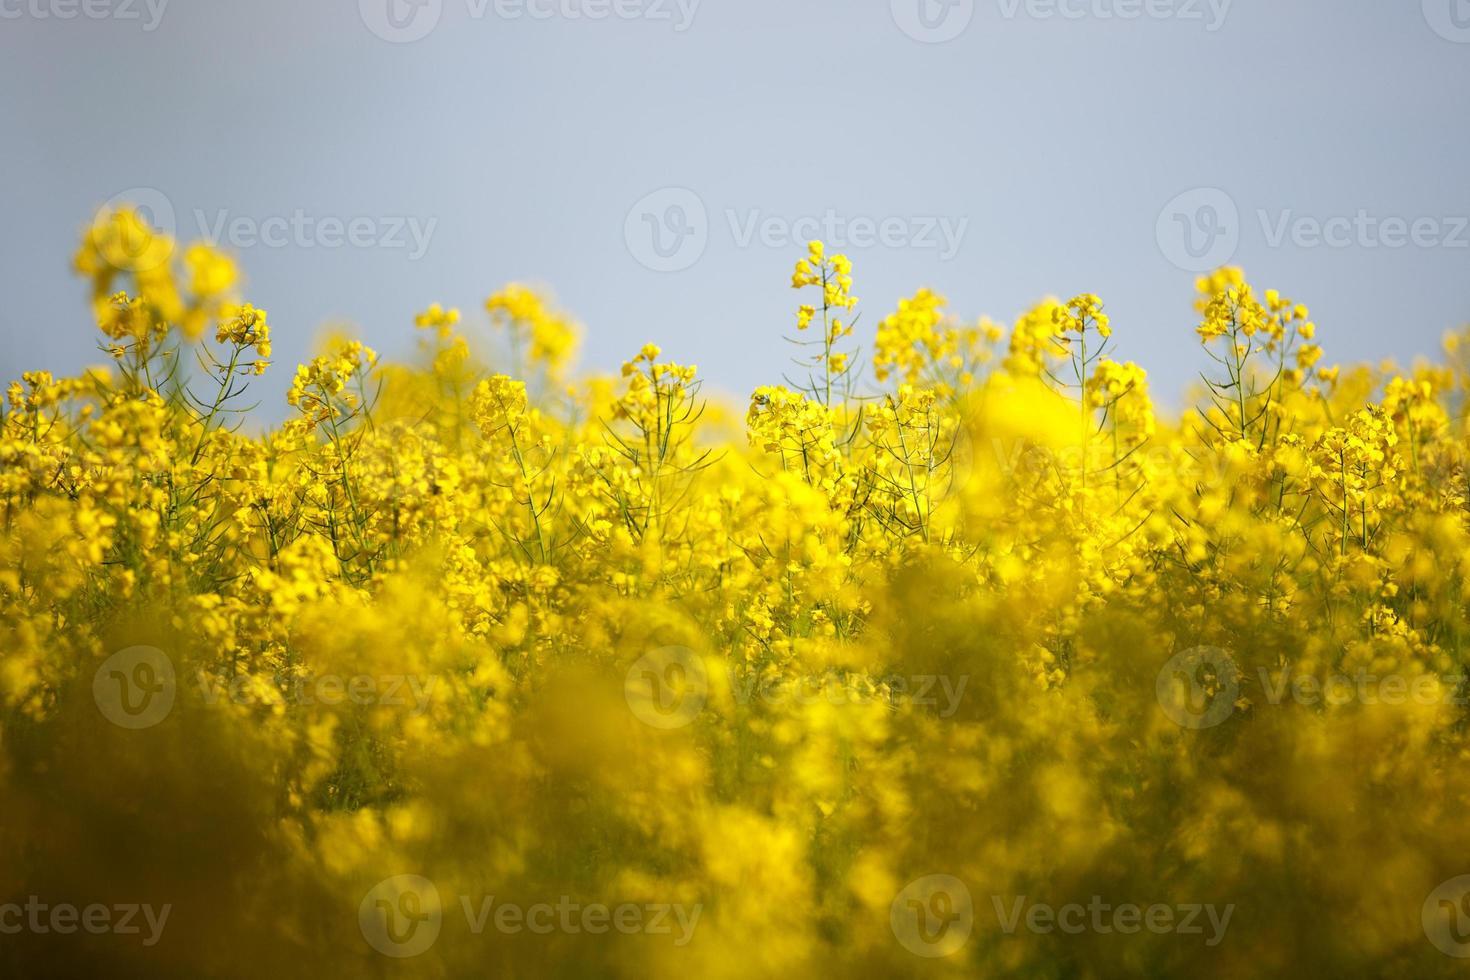 våldta blommor foto